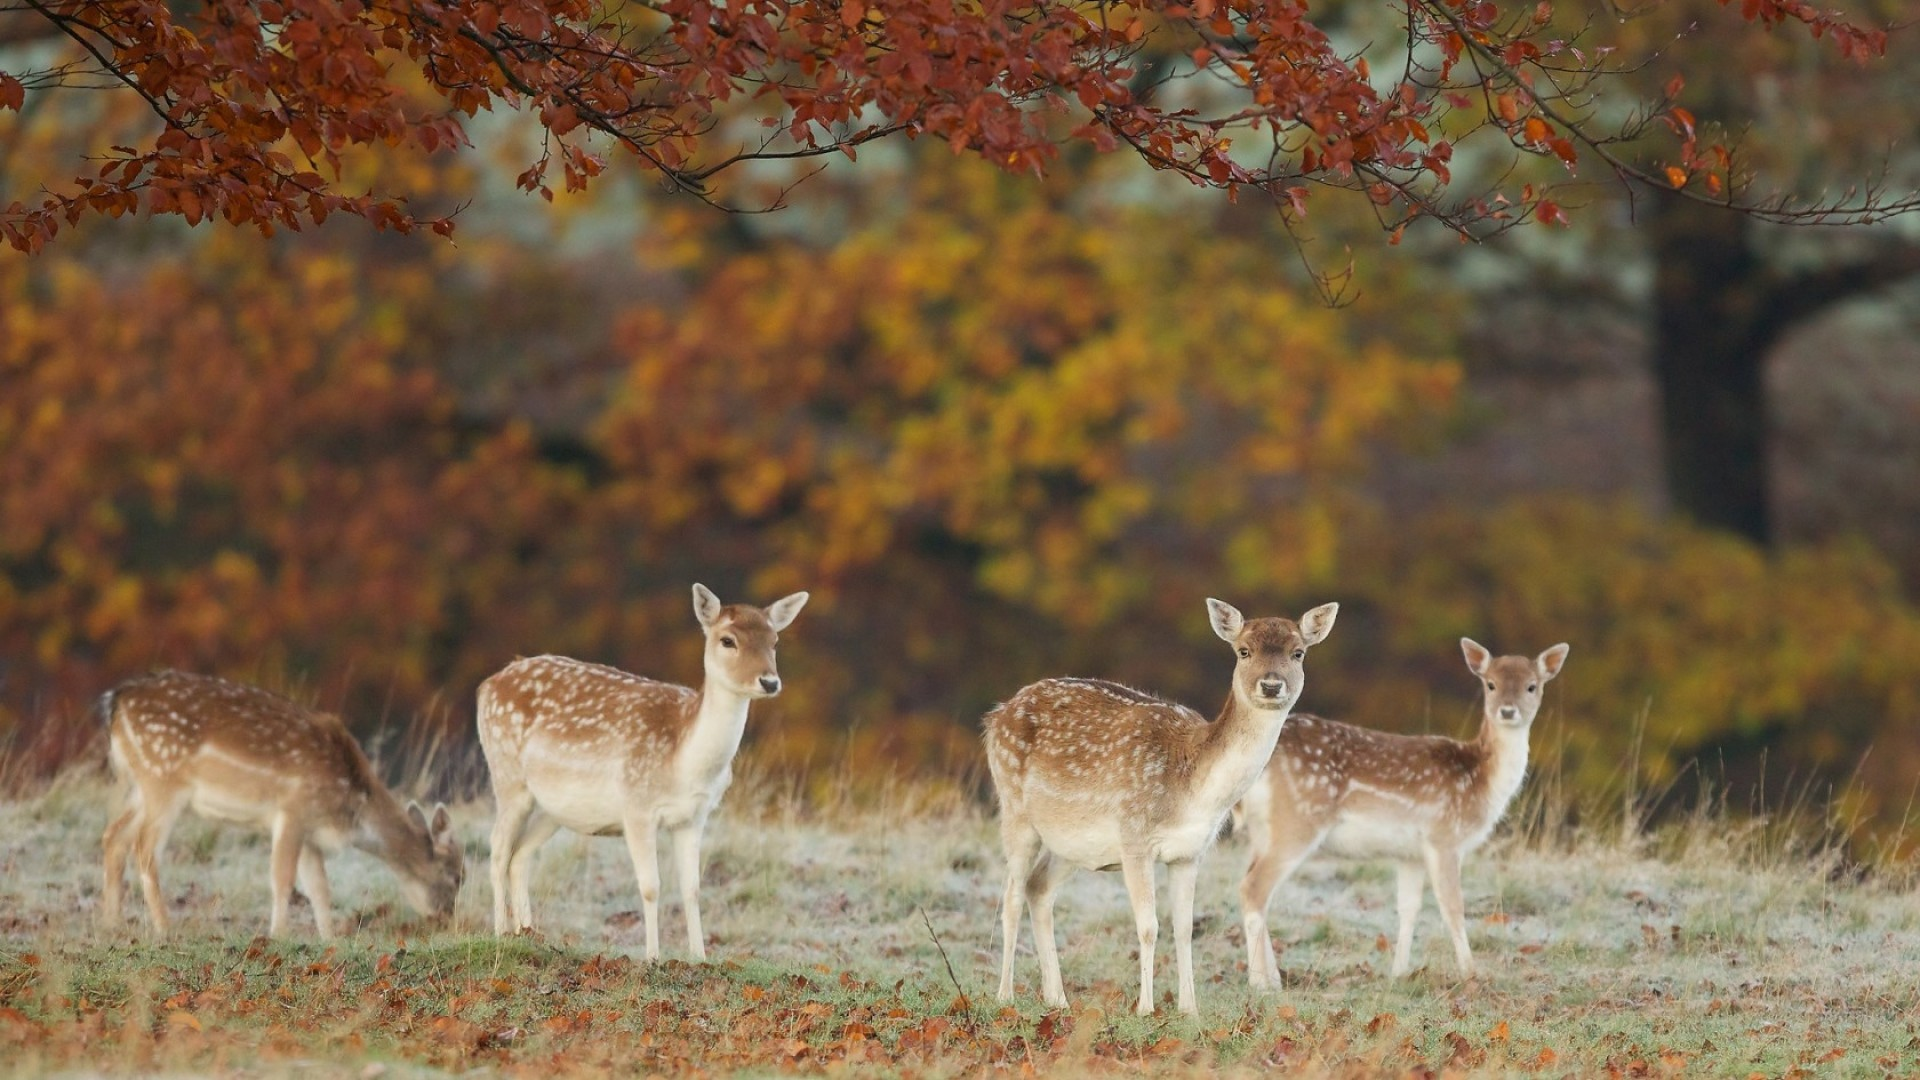 … Background Full HD 1080p. Wallpaper deer, nature, fall, leaves